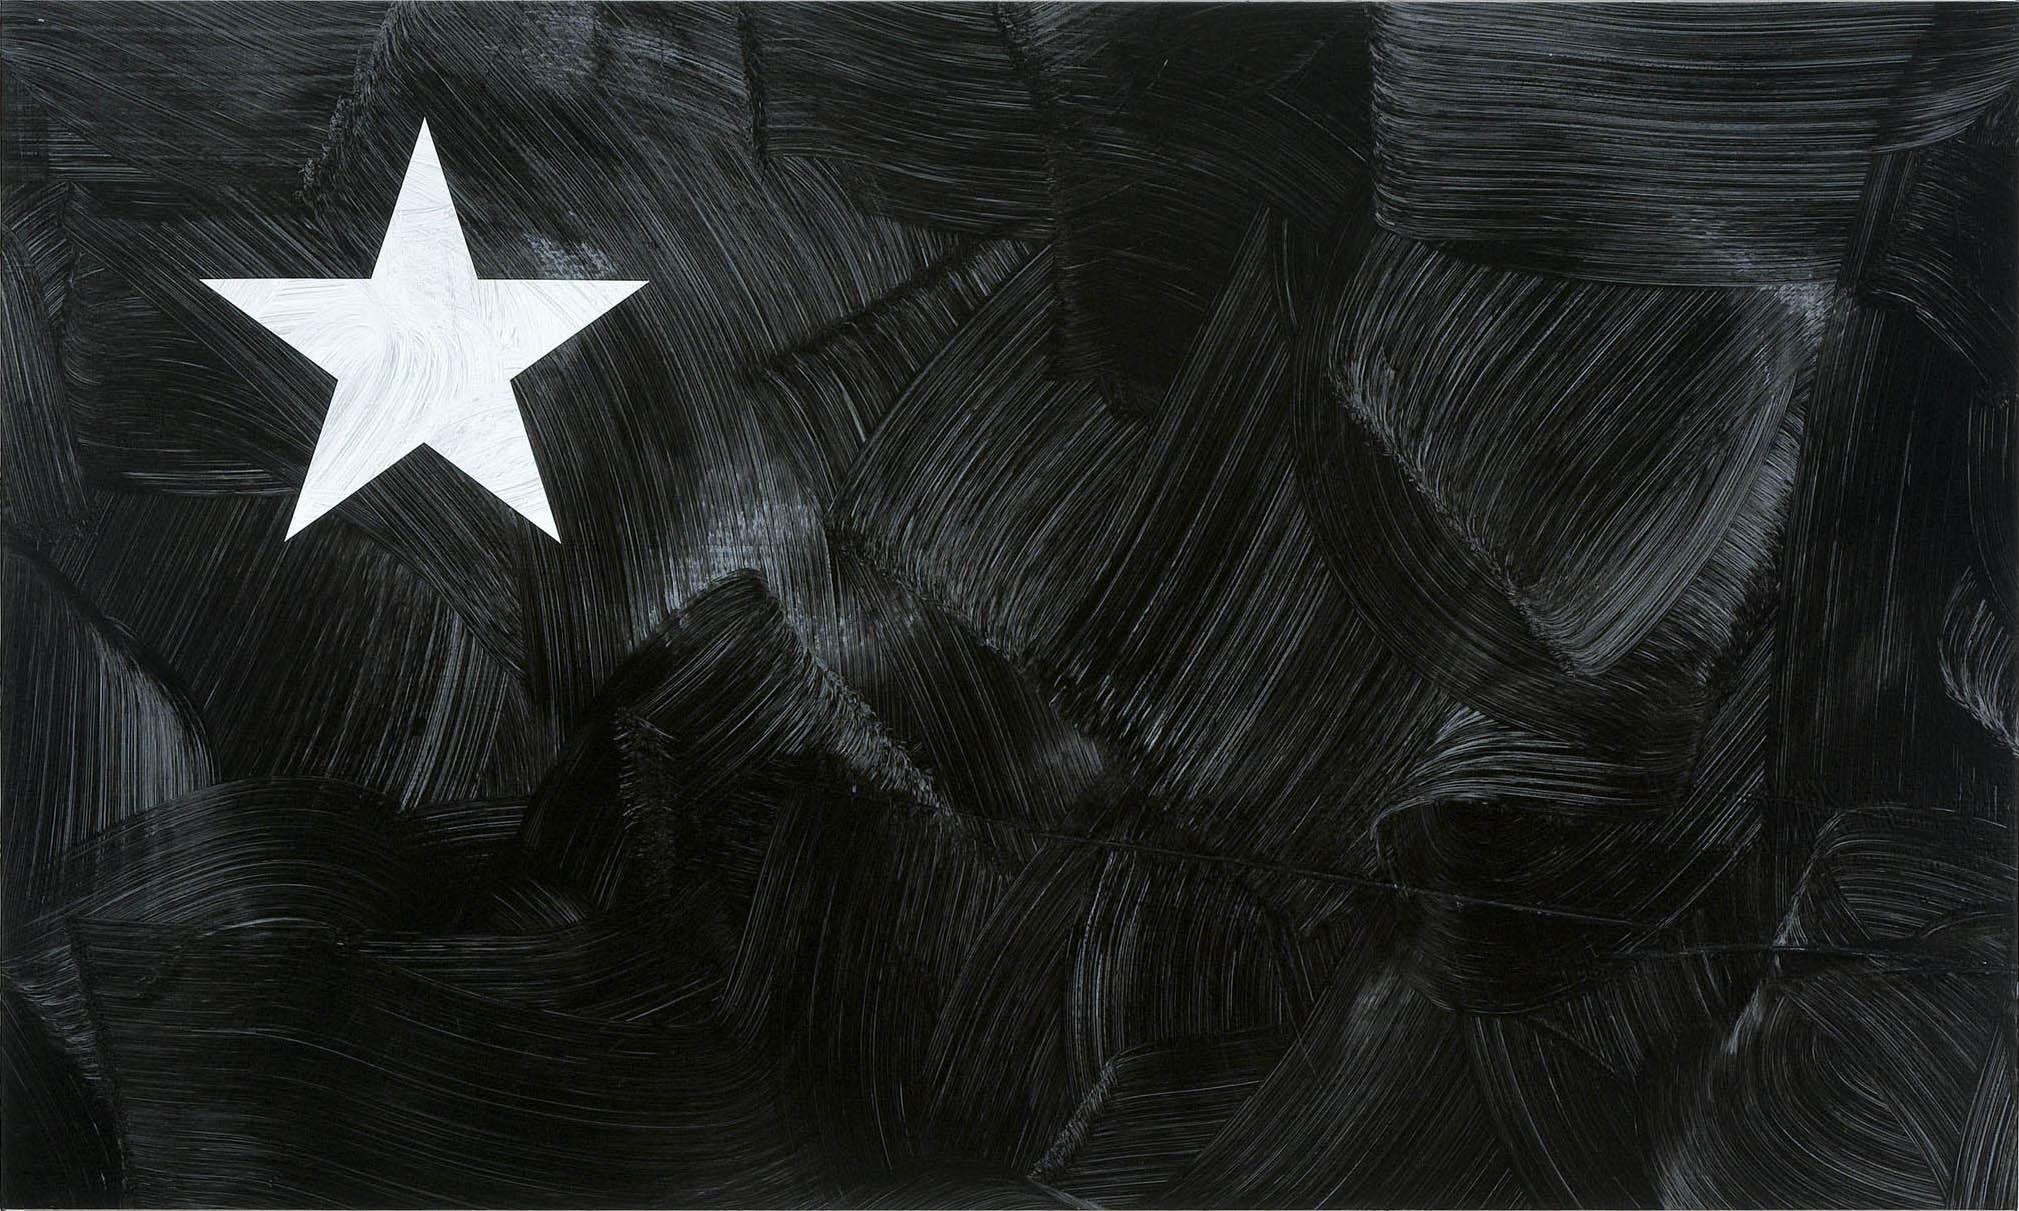 Louis Cameron   Black American Flag (after www.blackamericanflag.com), 2009  